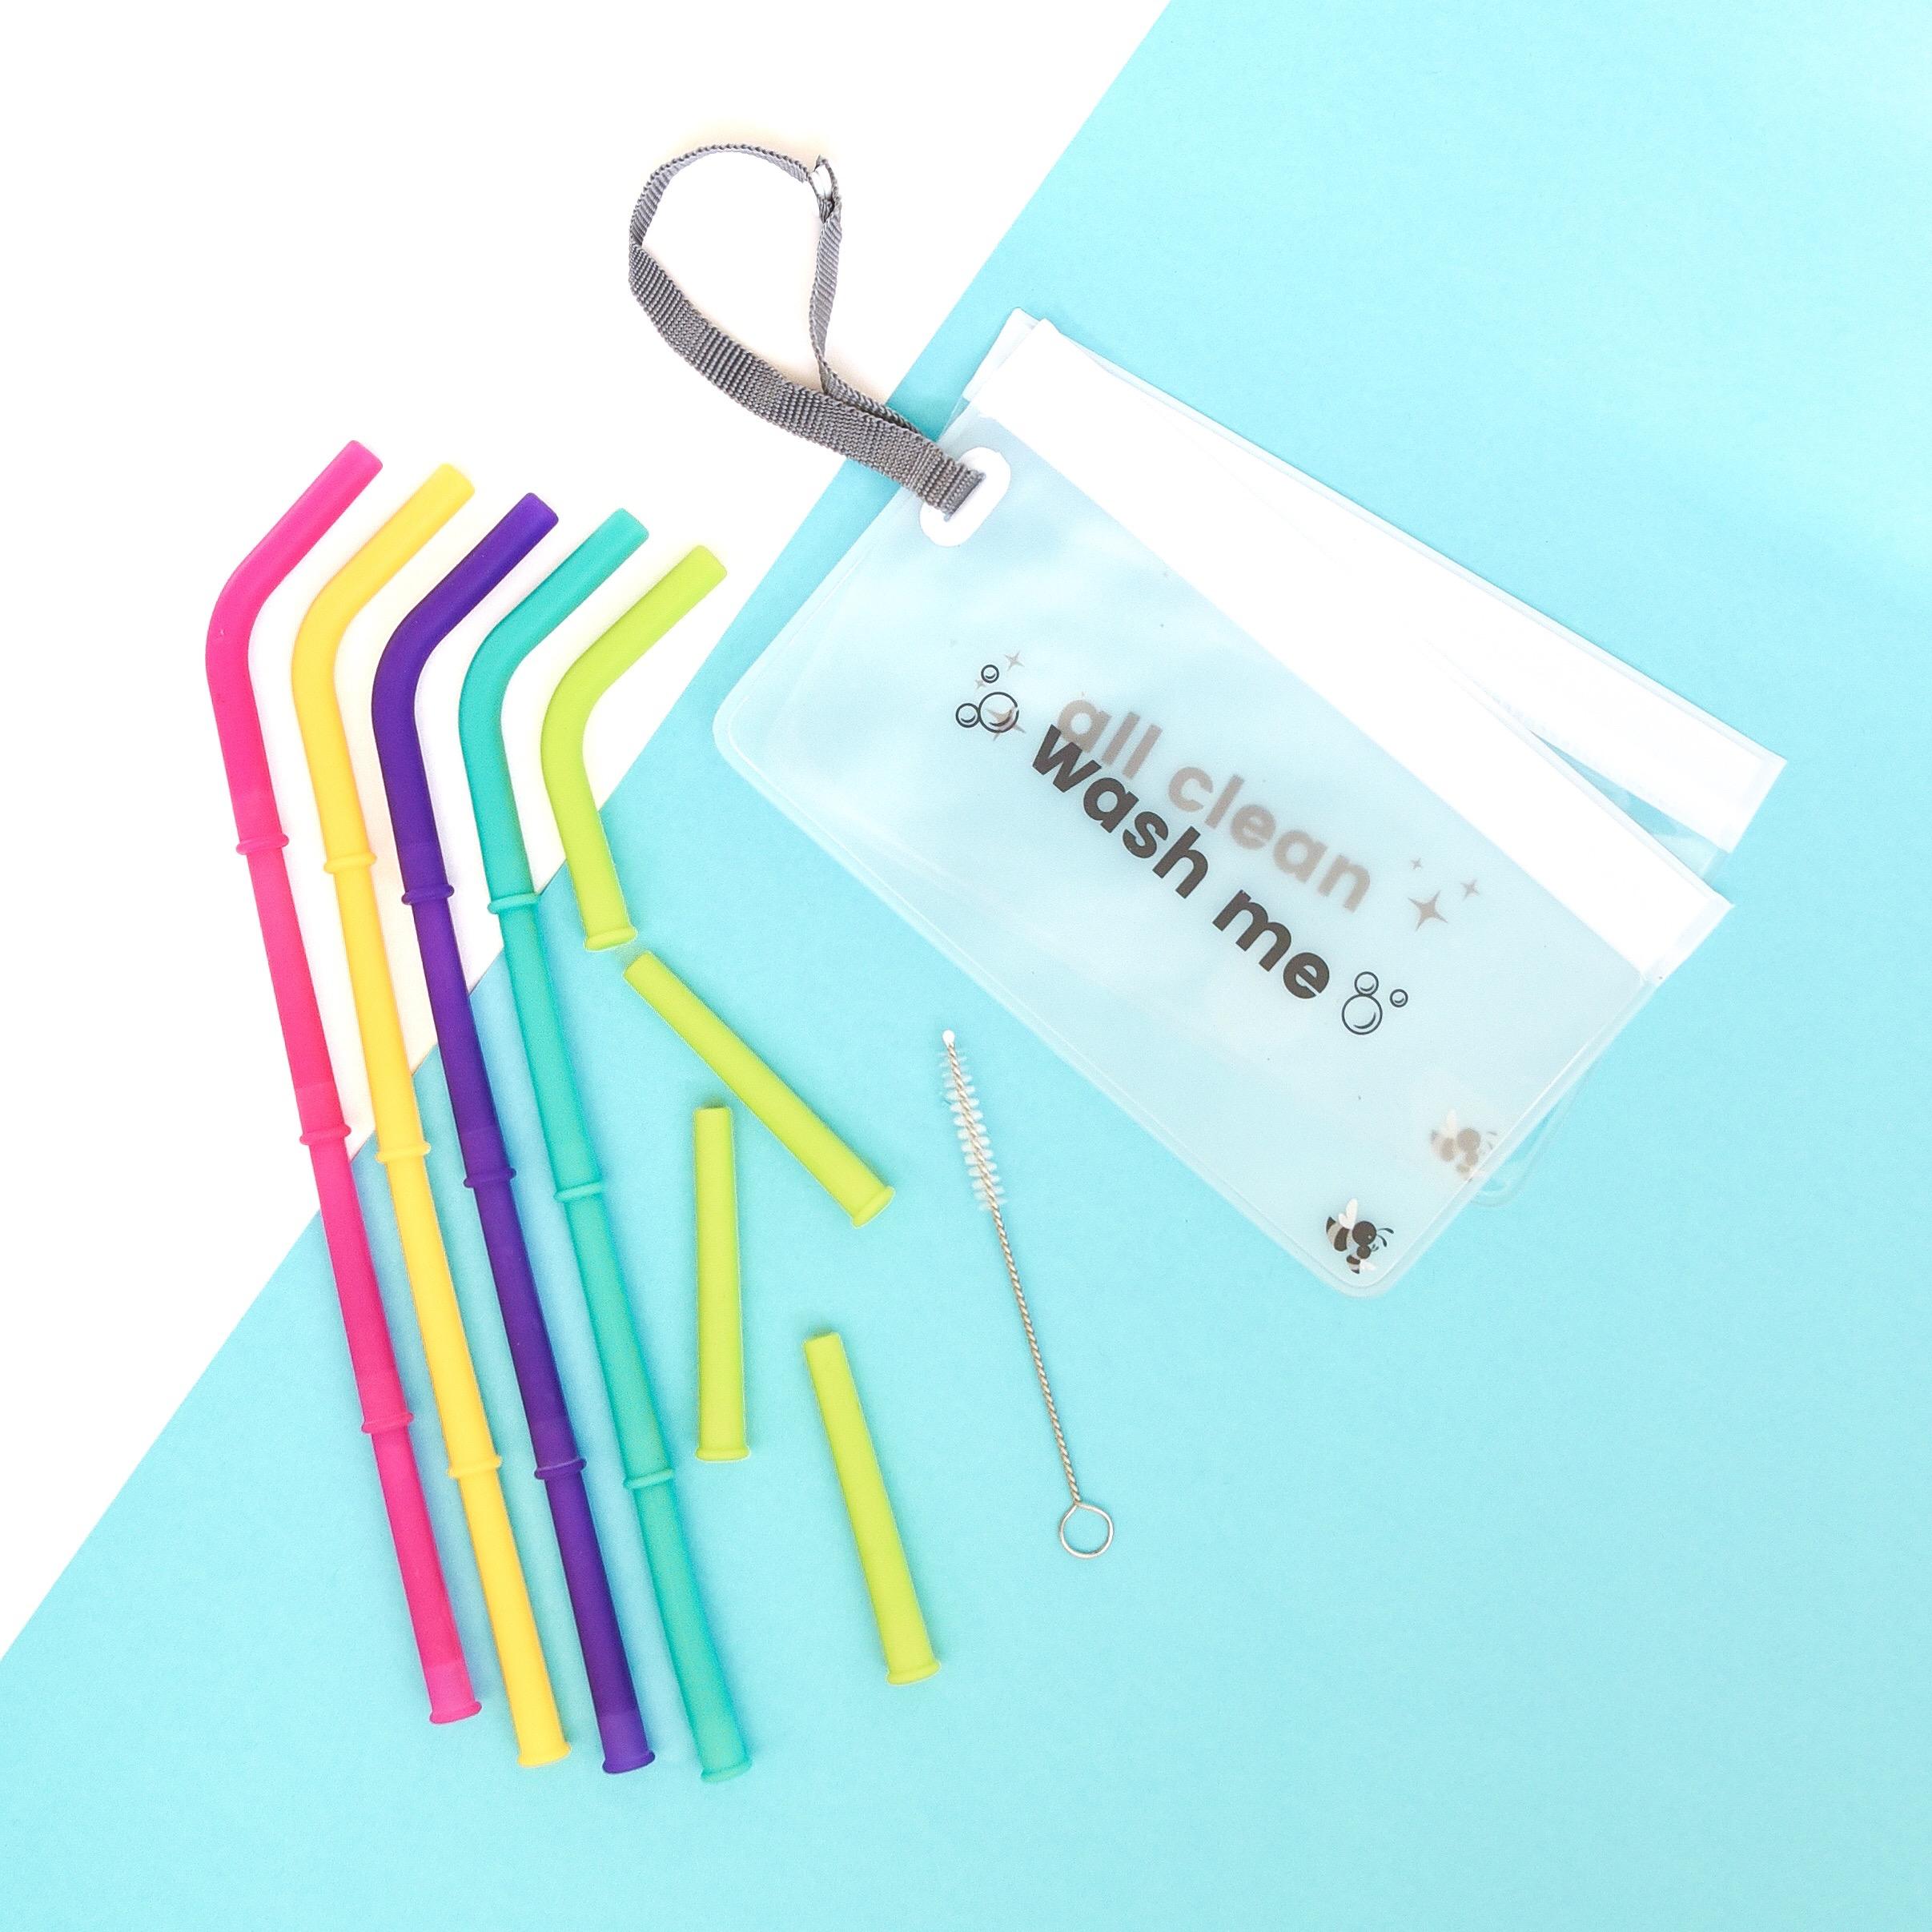 Build-A-Straw Reusable Silicone Straws Starter Kit